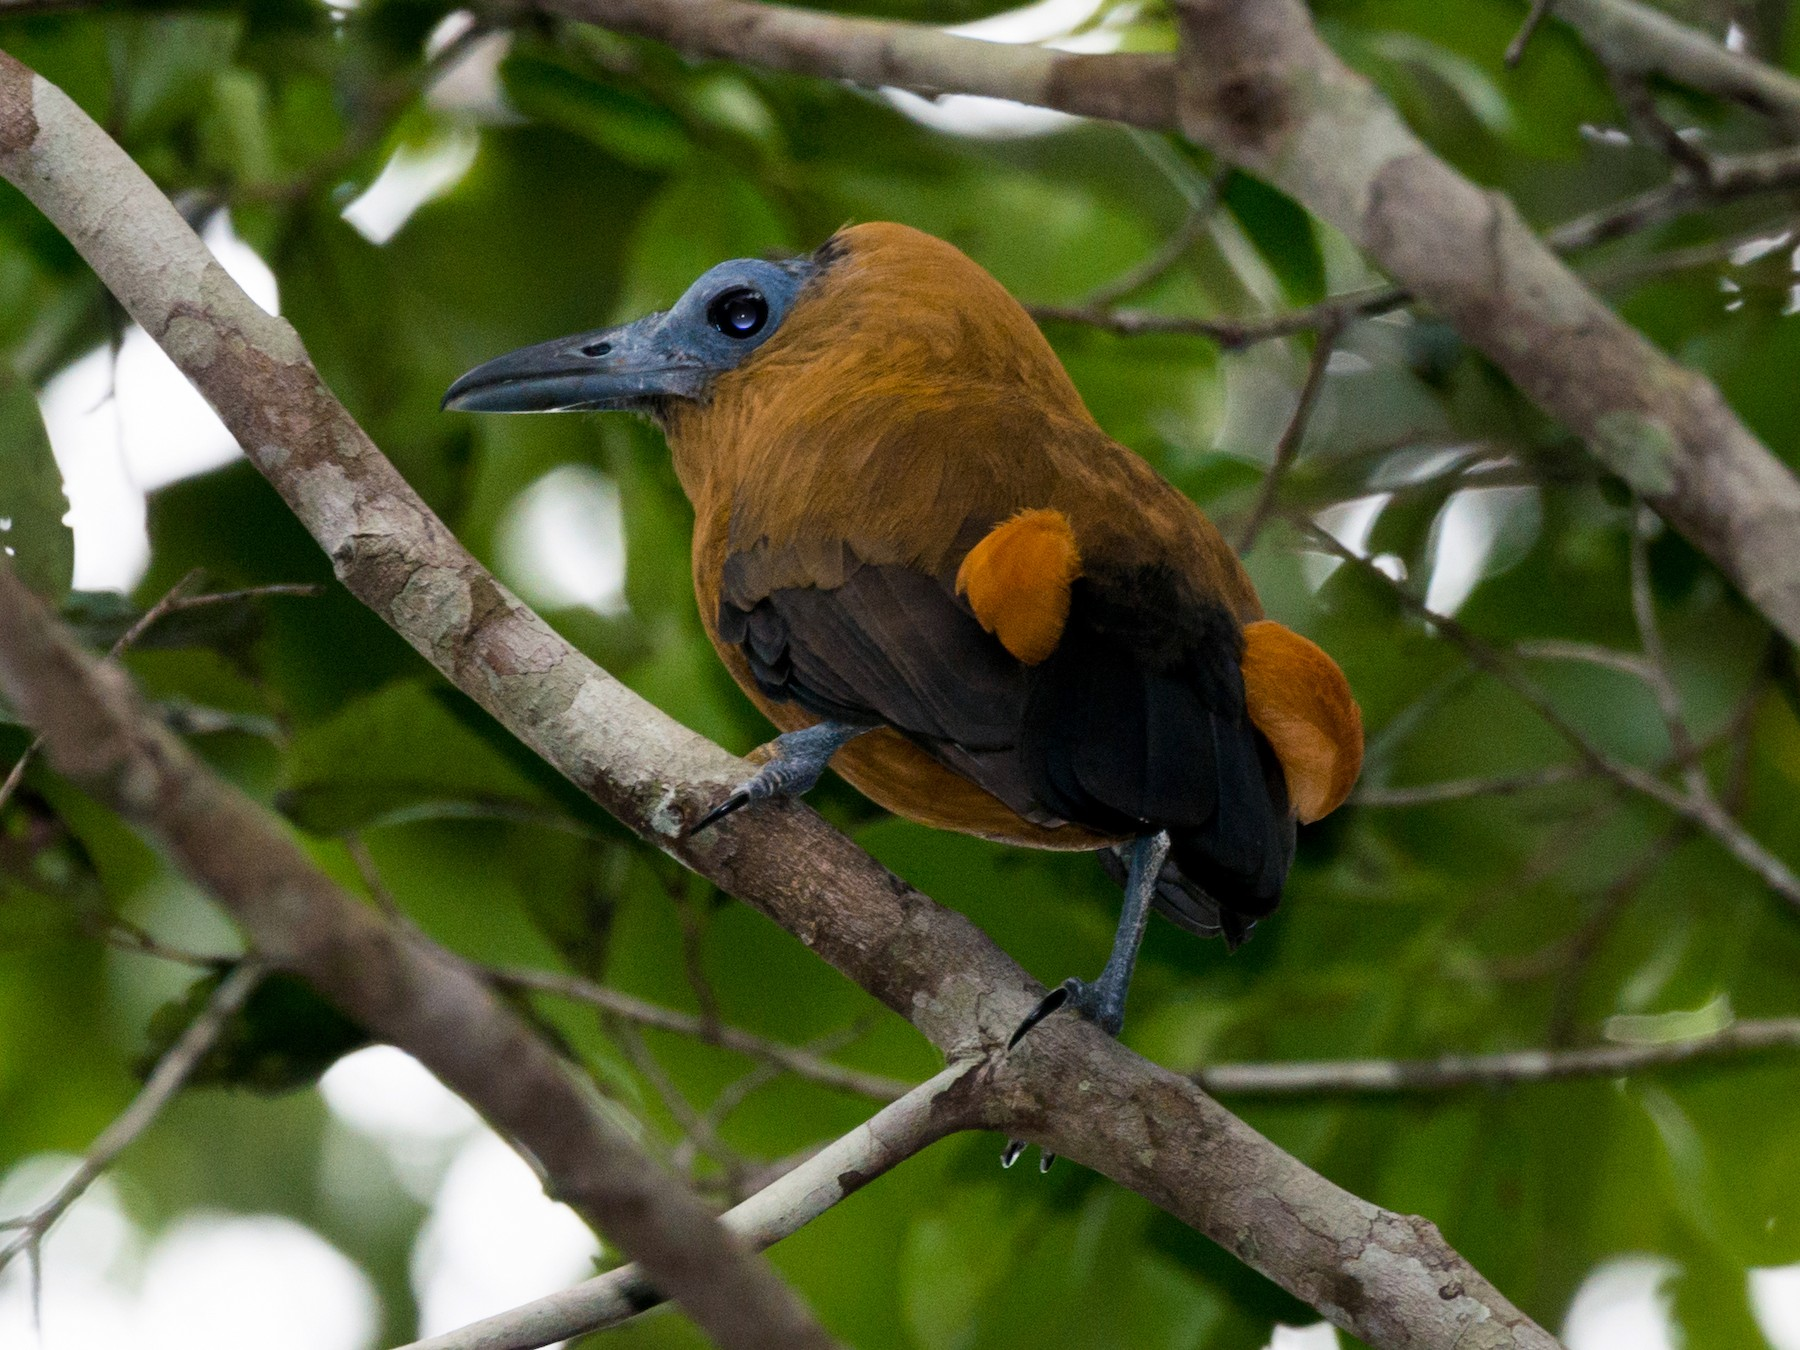 Capuchinbird - Claudia Brasileiro